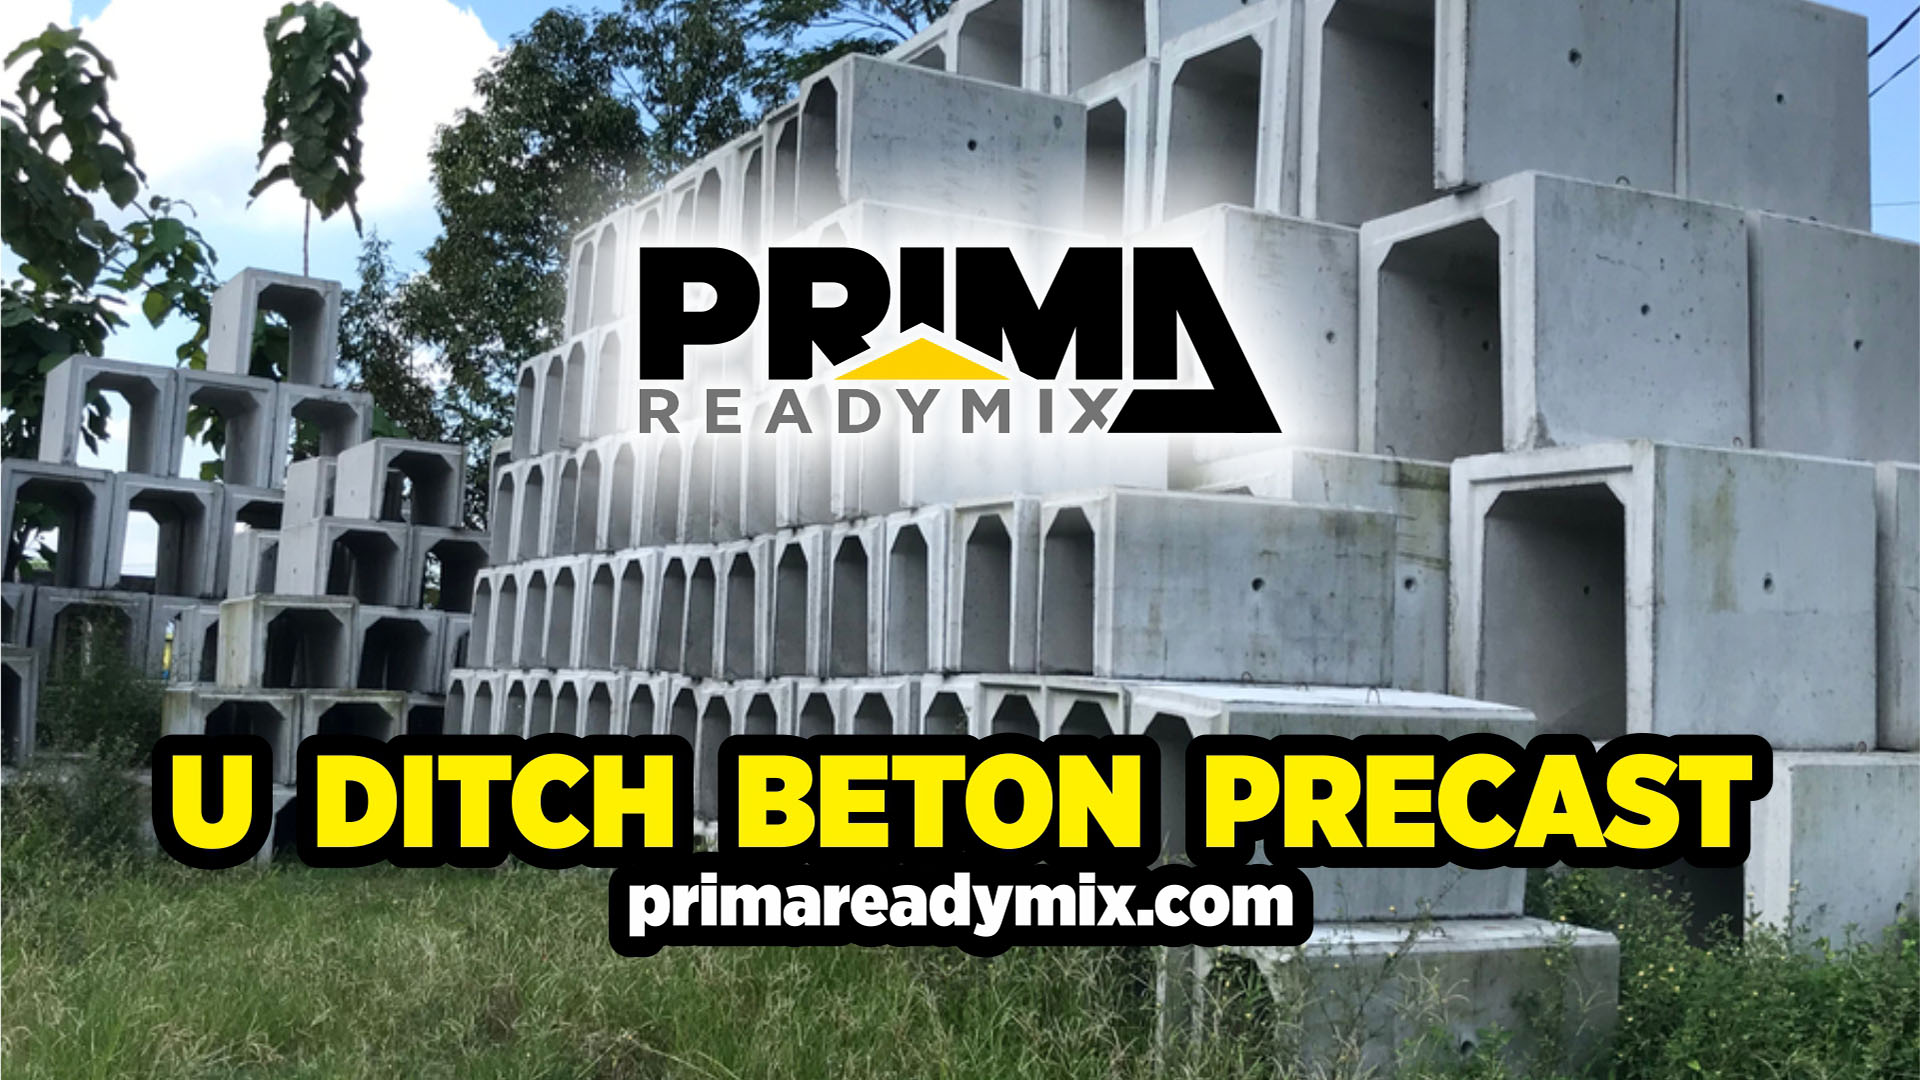 Harga U Ditch Beton Precast oke